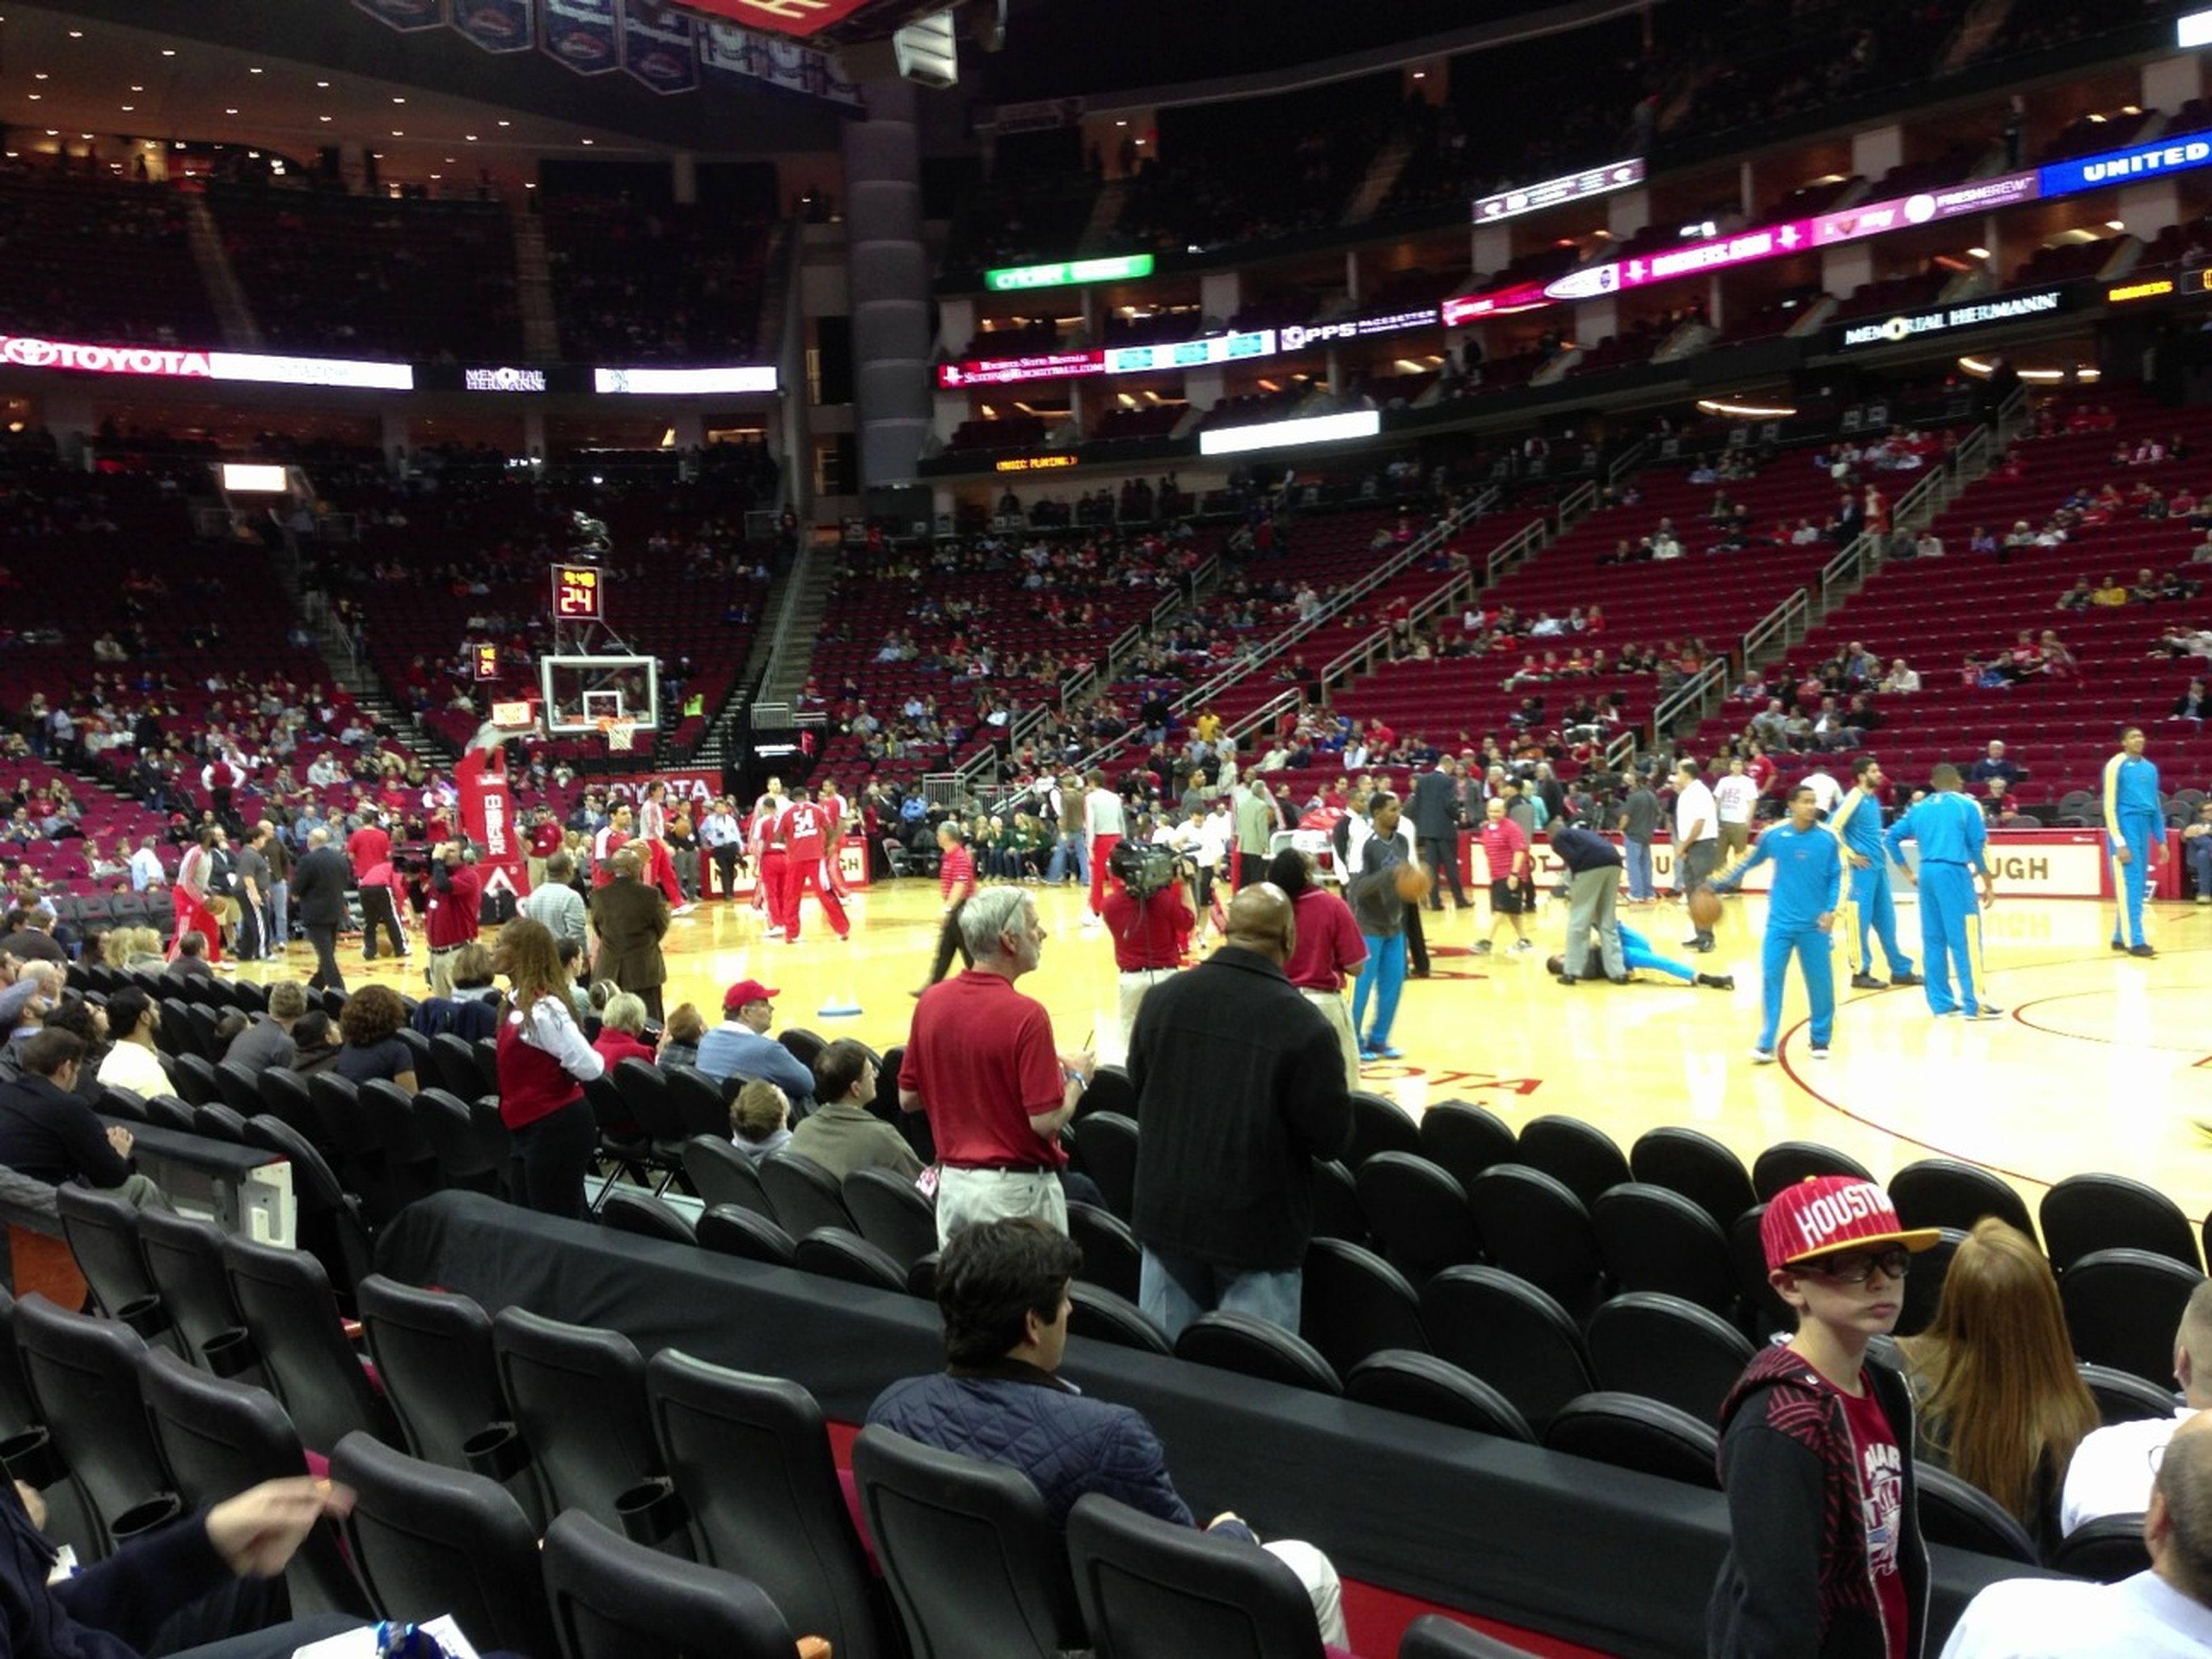 At The Houston Rockets